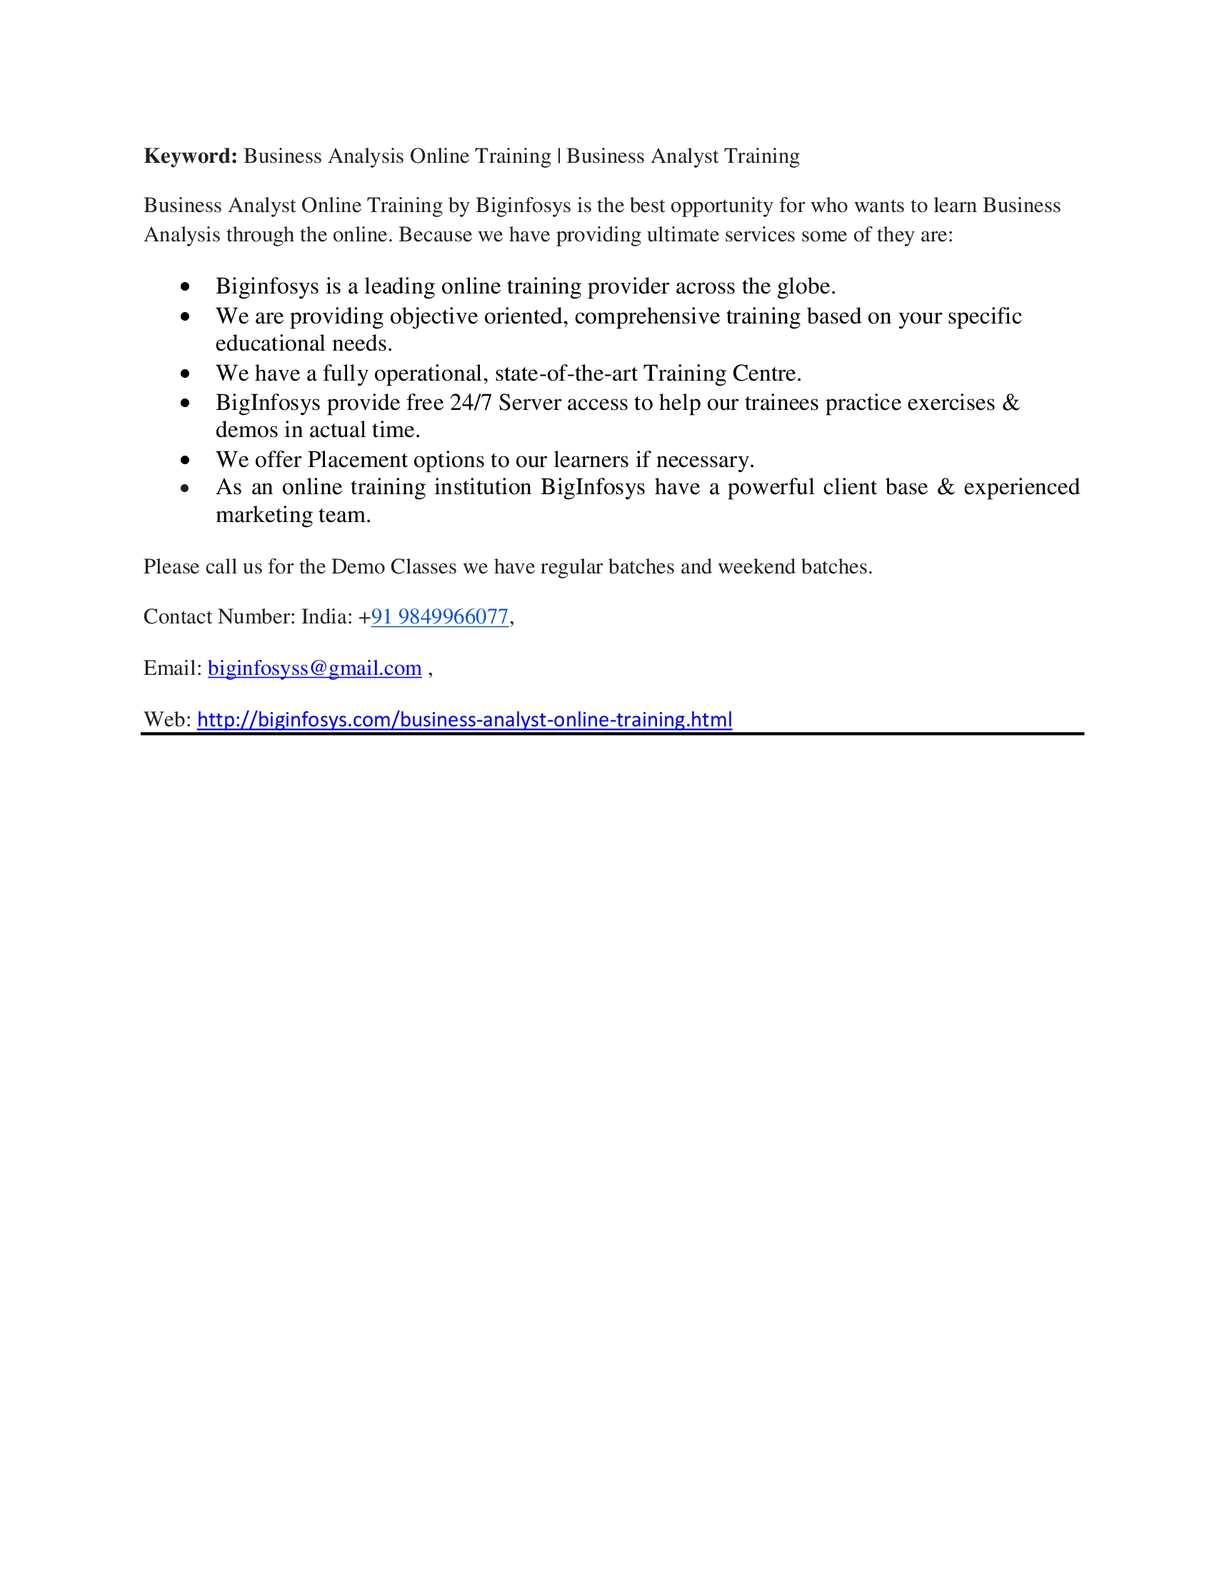 Calamo Business Analysis Online Training Business Analyst Training